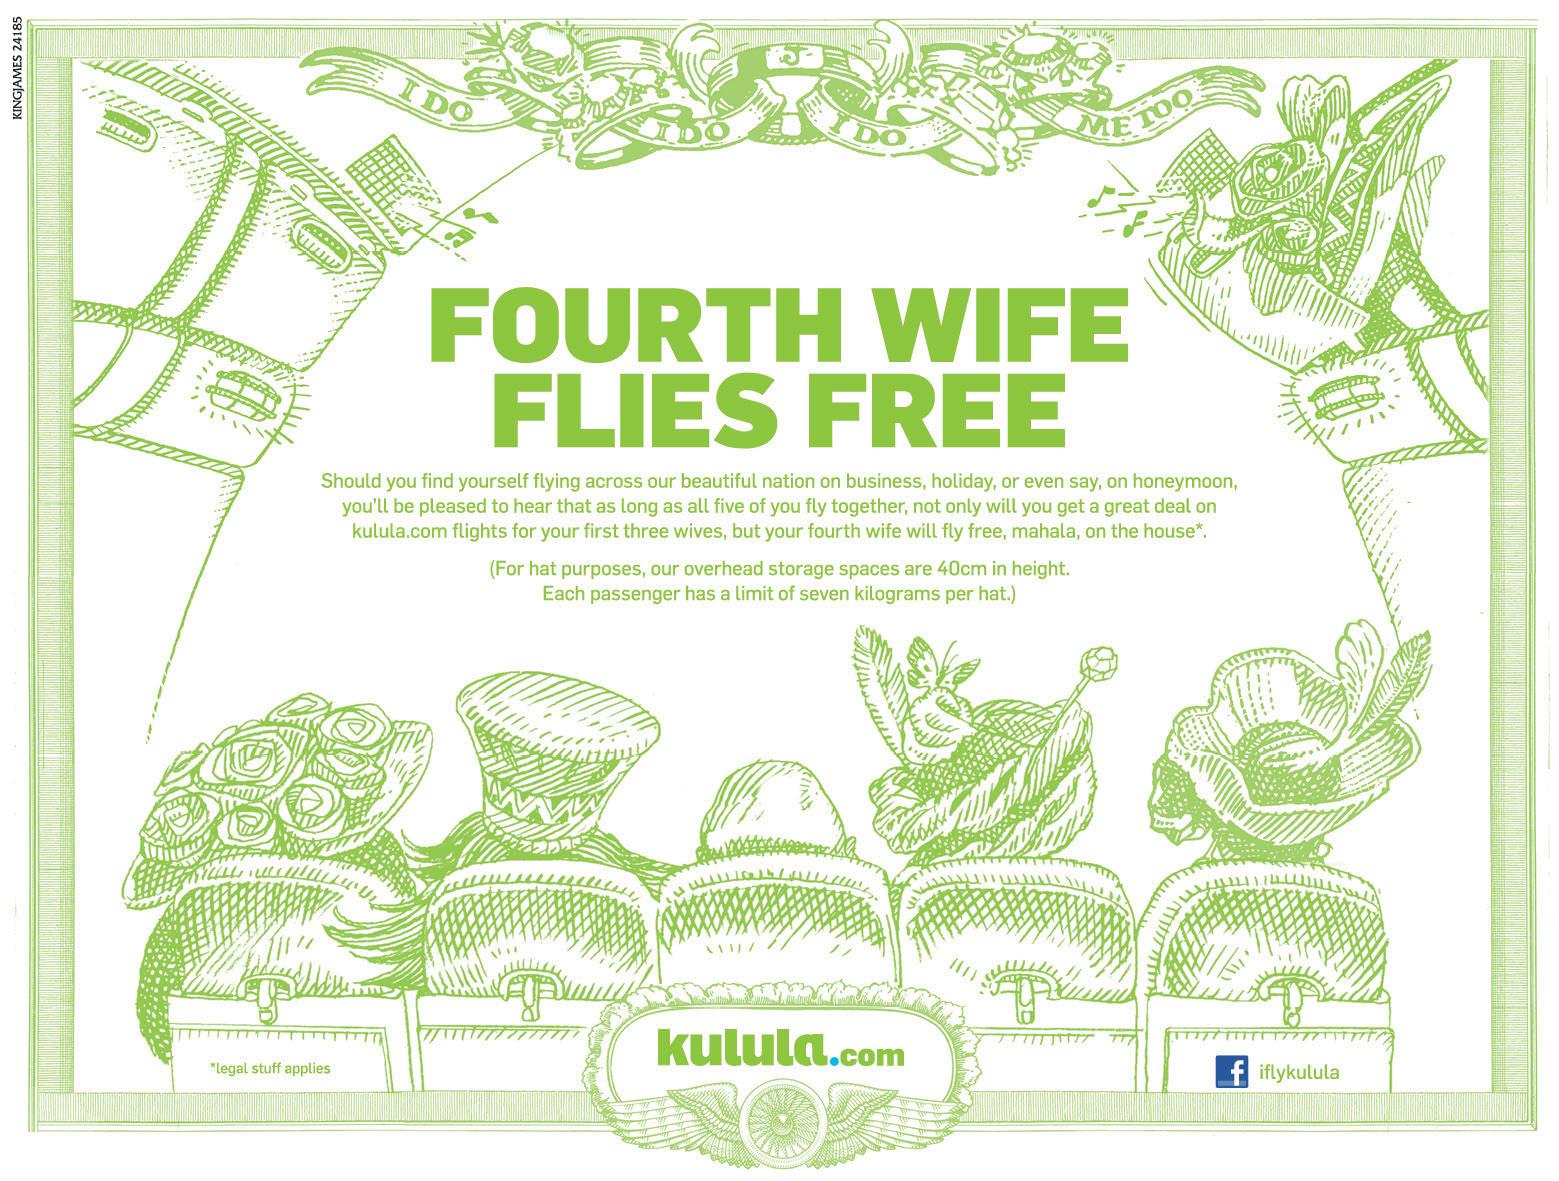 Kulula fourth wife flies free